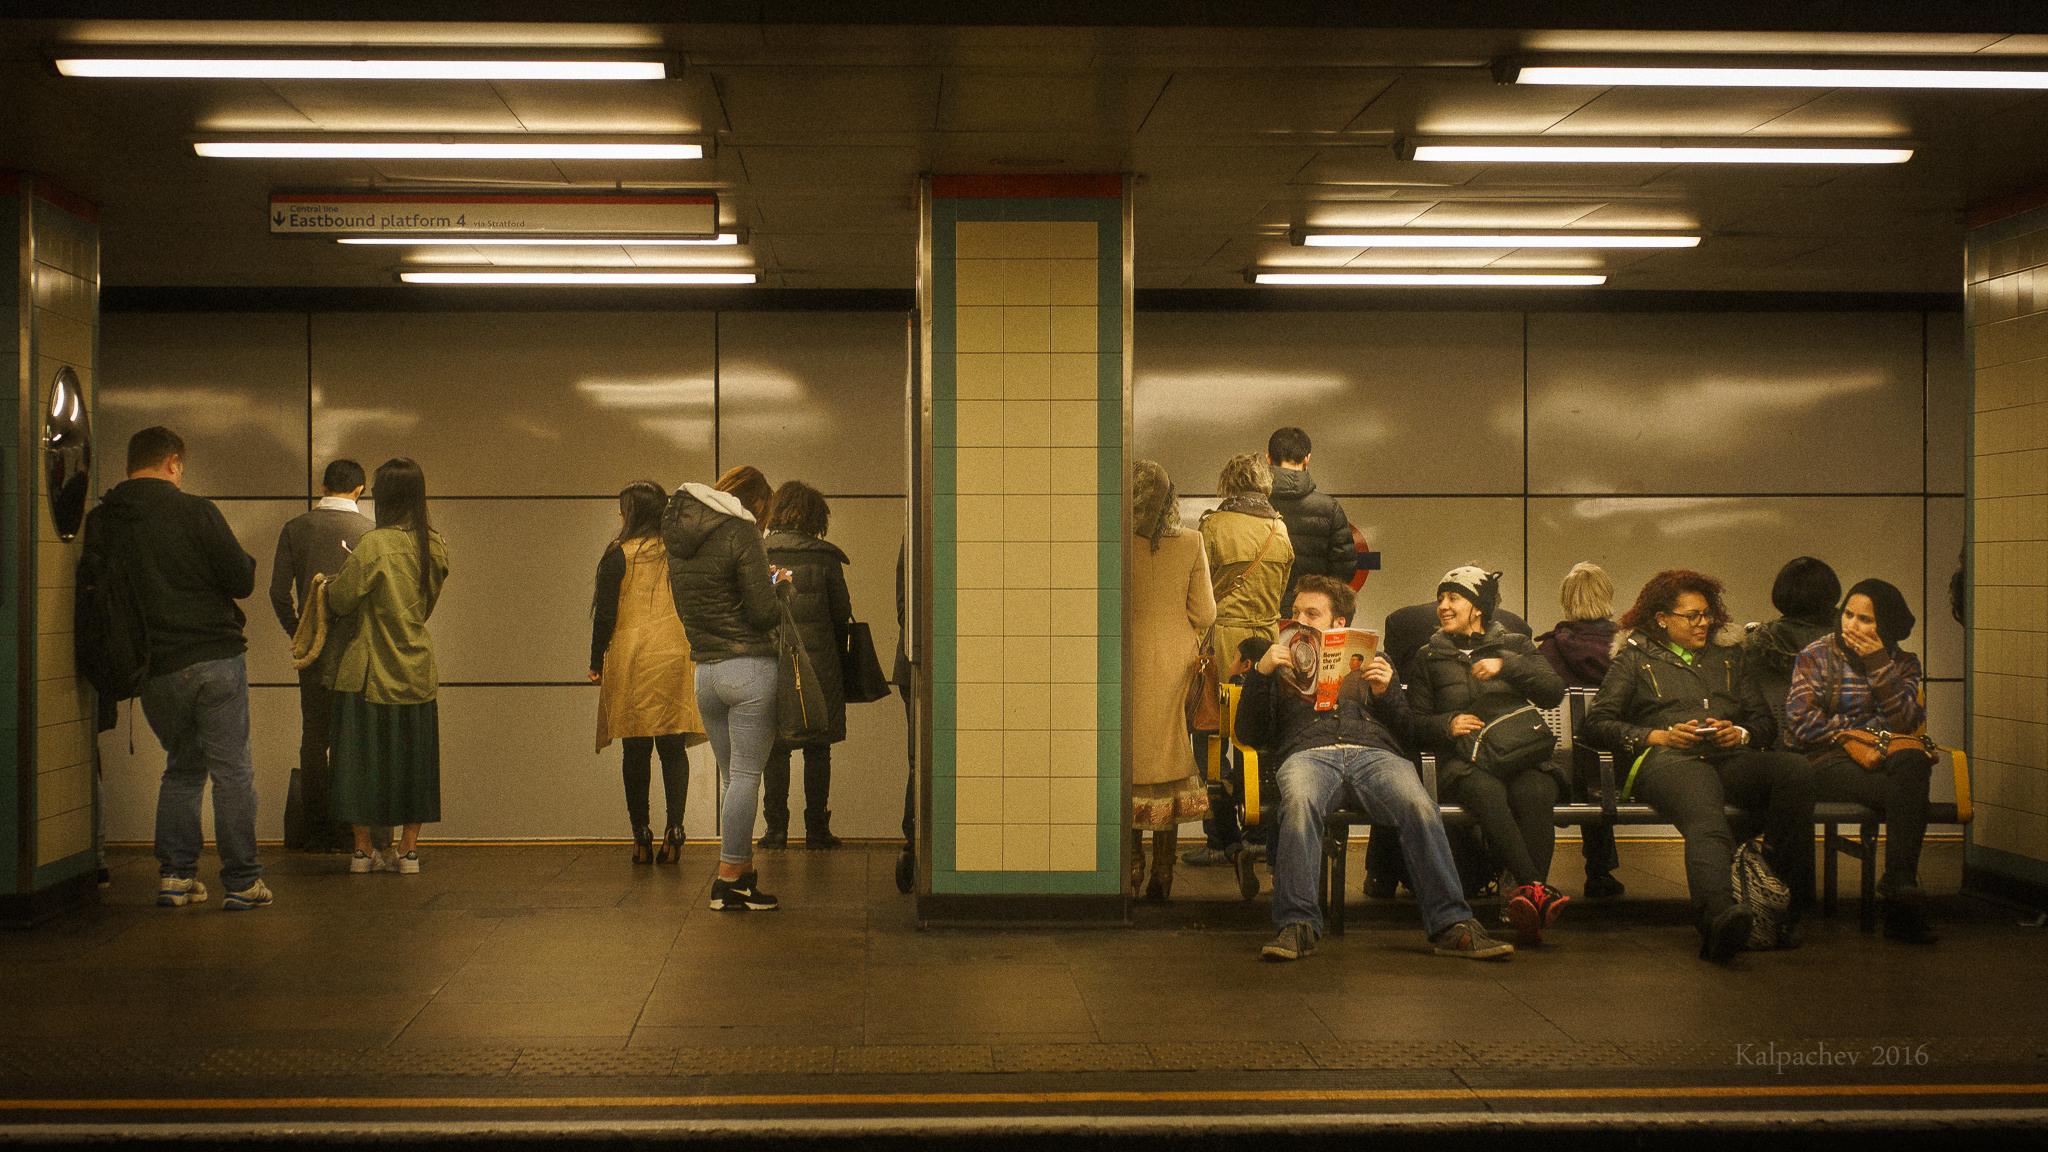 Mile end station – London Underground